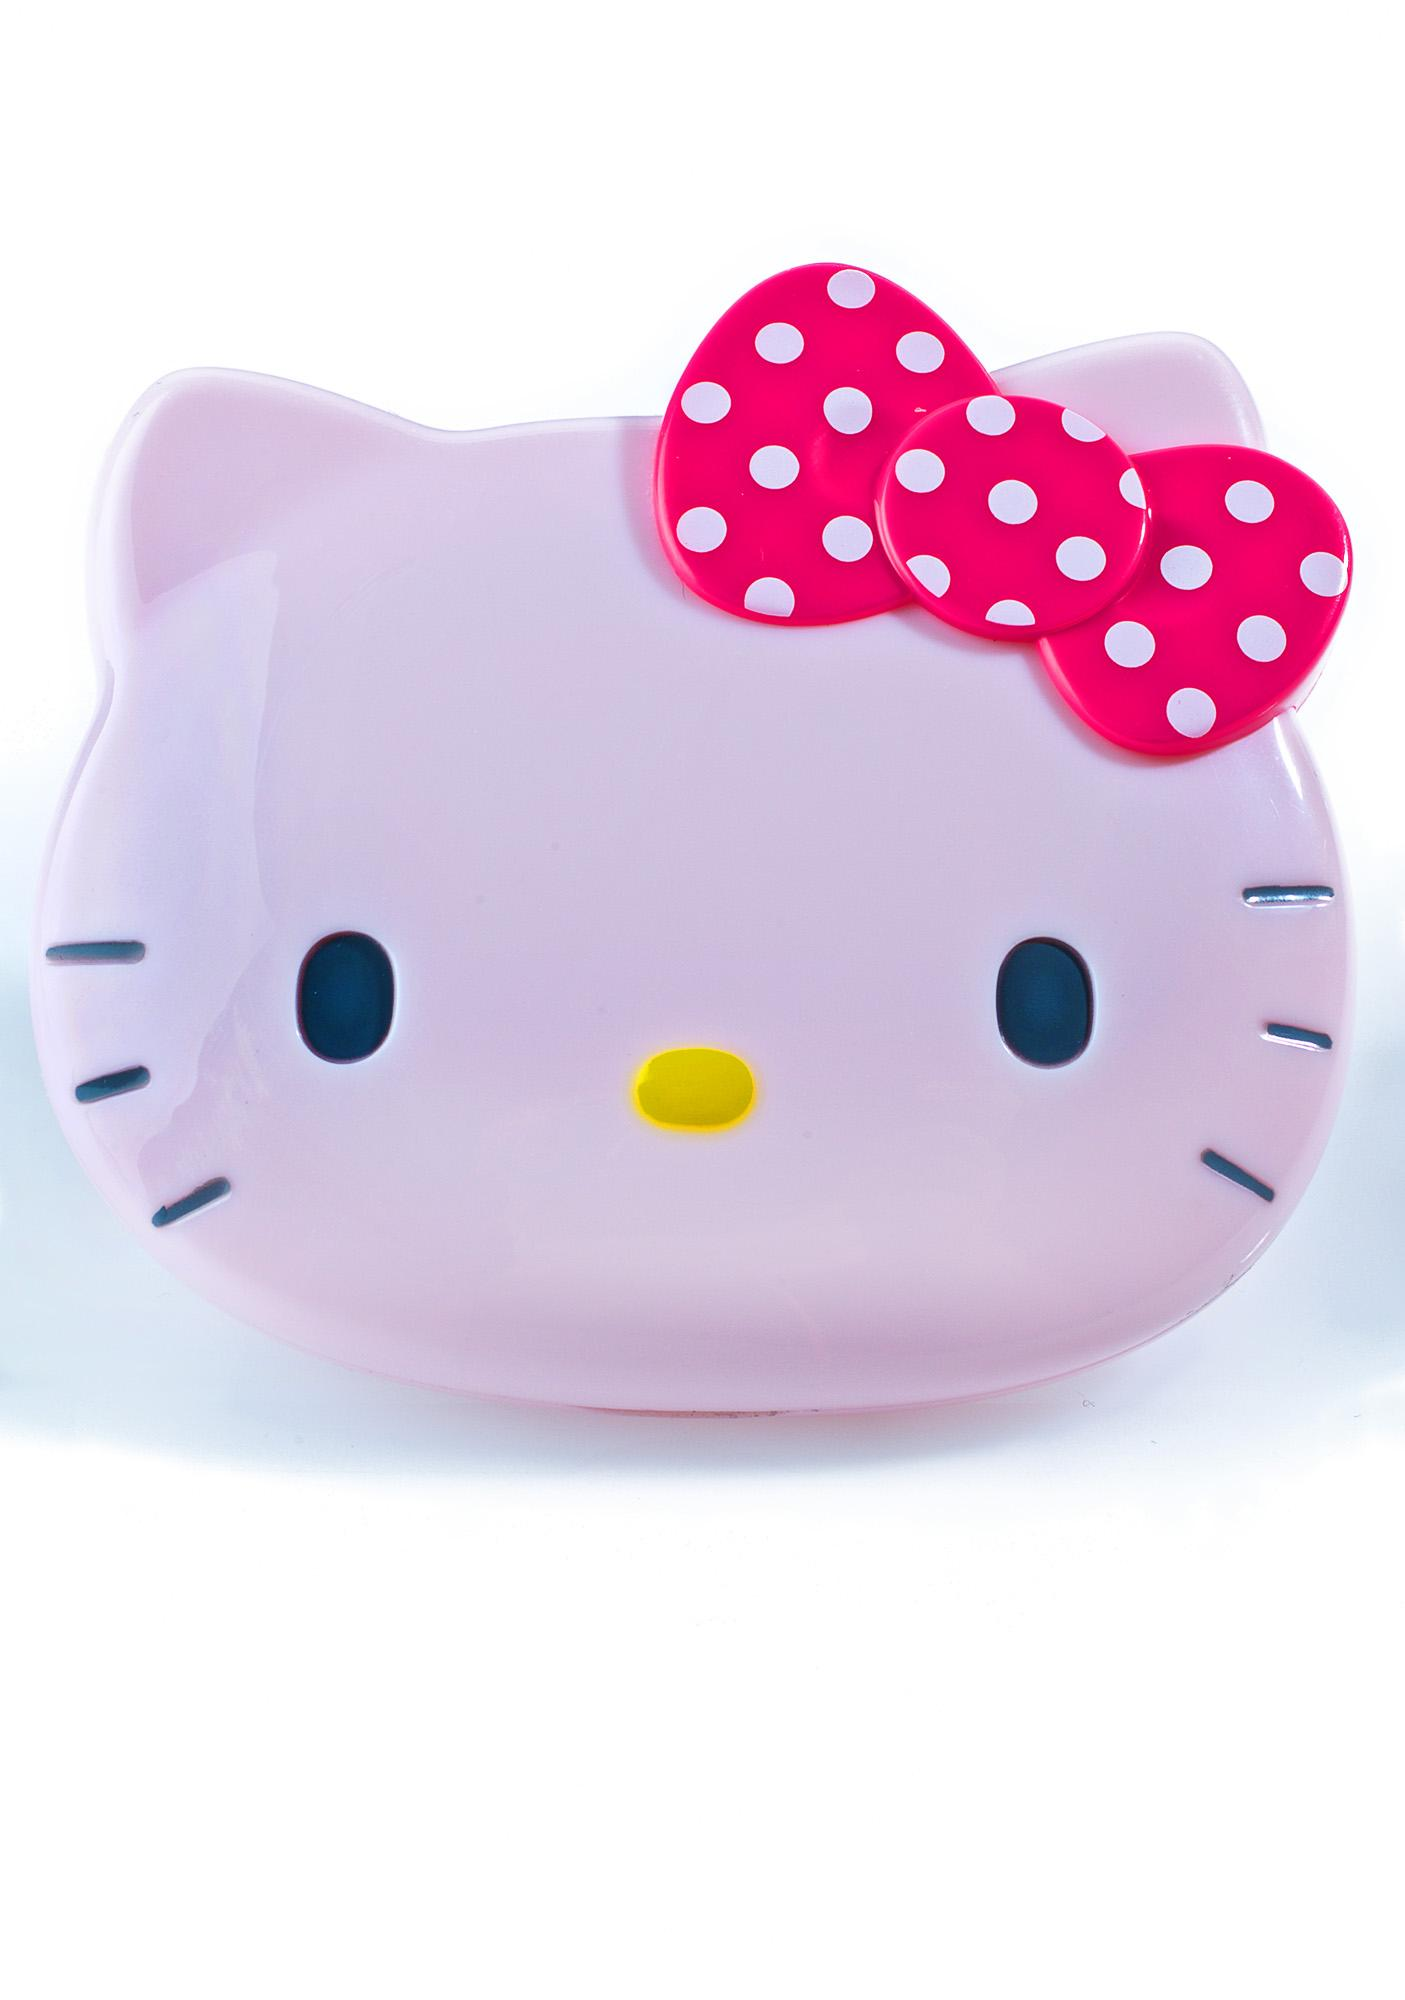 Sanrio Pinky Hello Kitty Compact Mirror